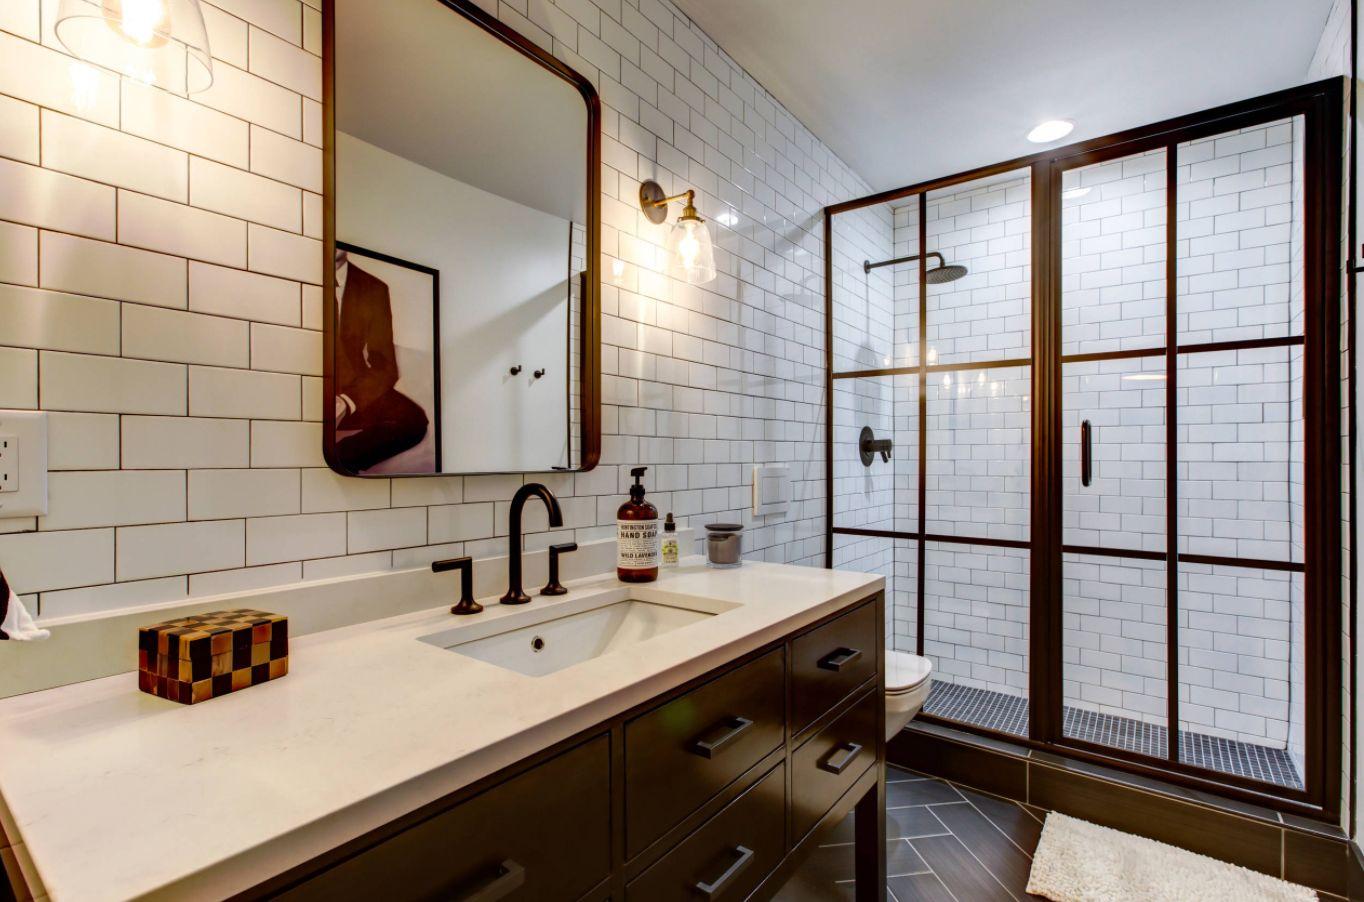 Bathroom Shower Tile | Stylish Ways To Modernize A Subway Tile Shower